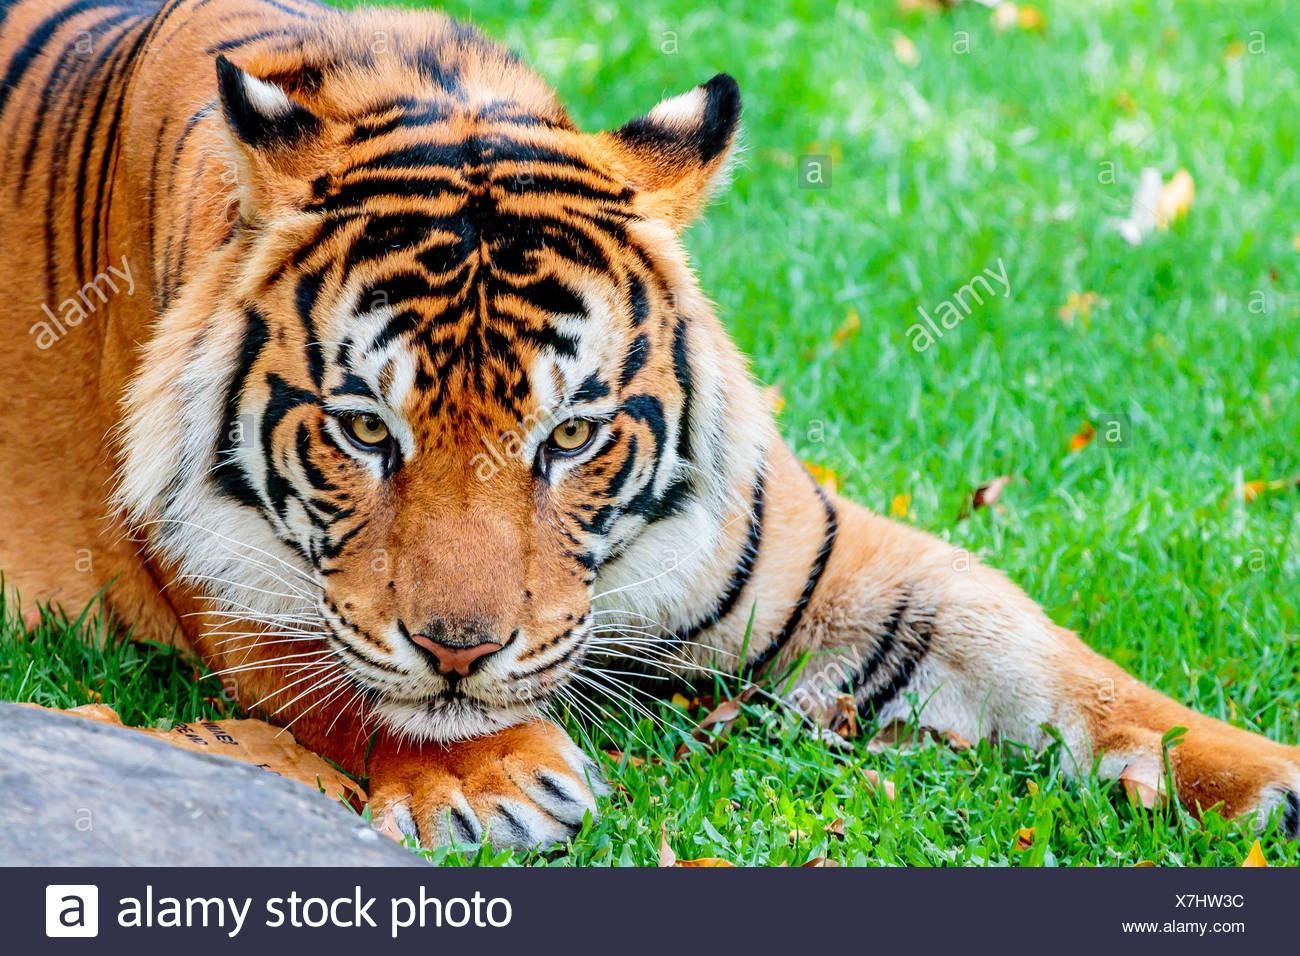 Pre-pounce Tiger - Stock Image